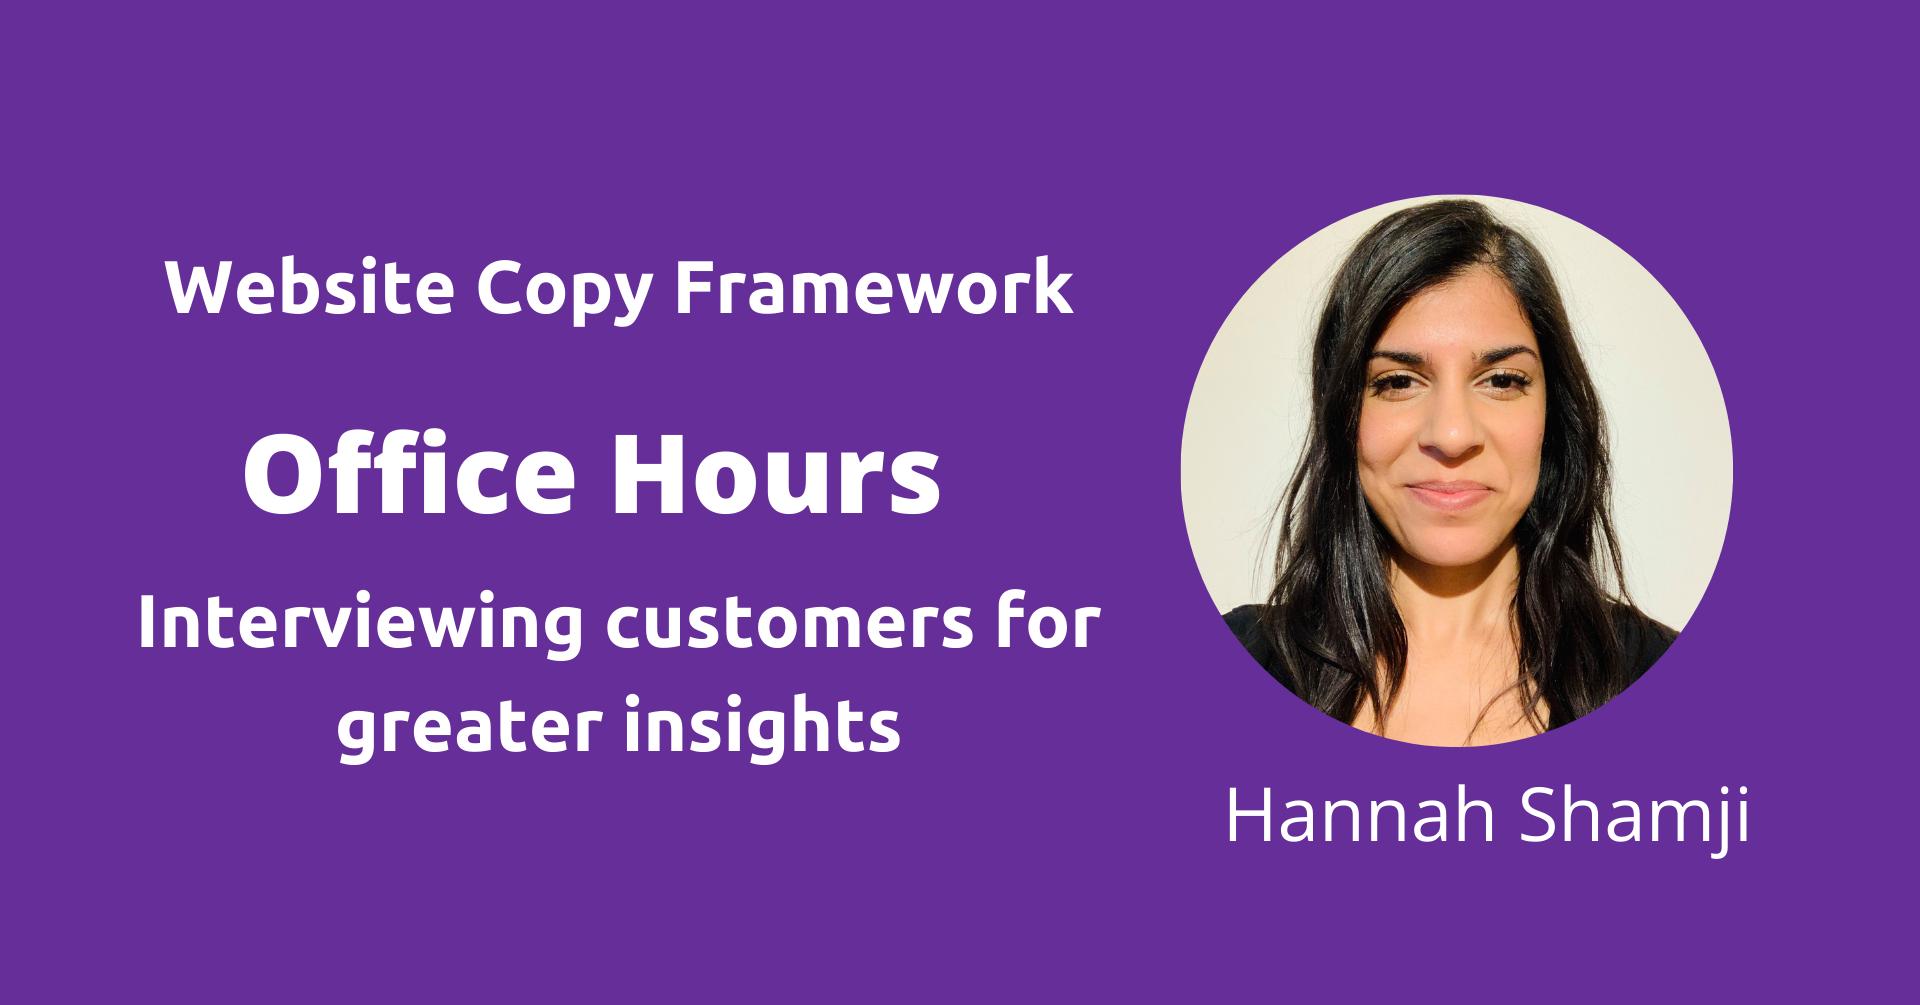 Office Hours with Hannah Shamji